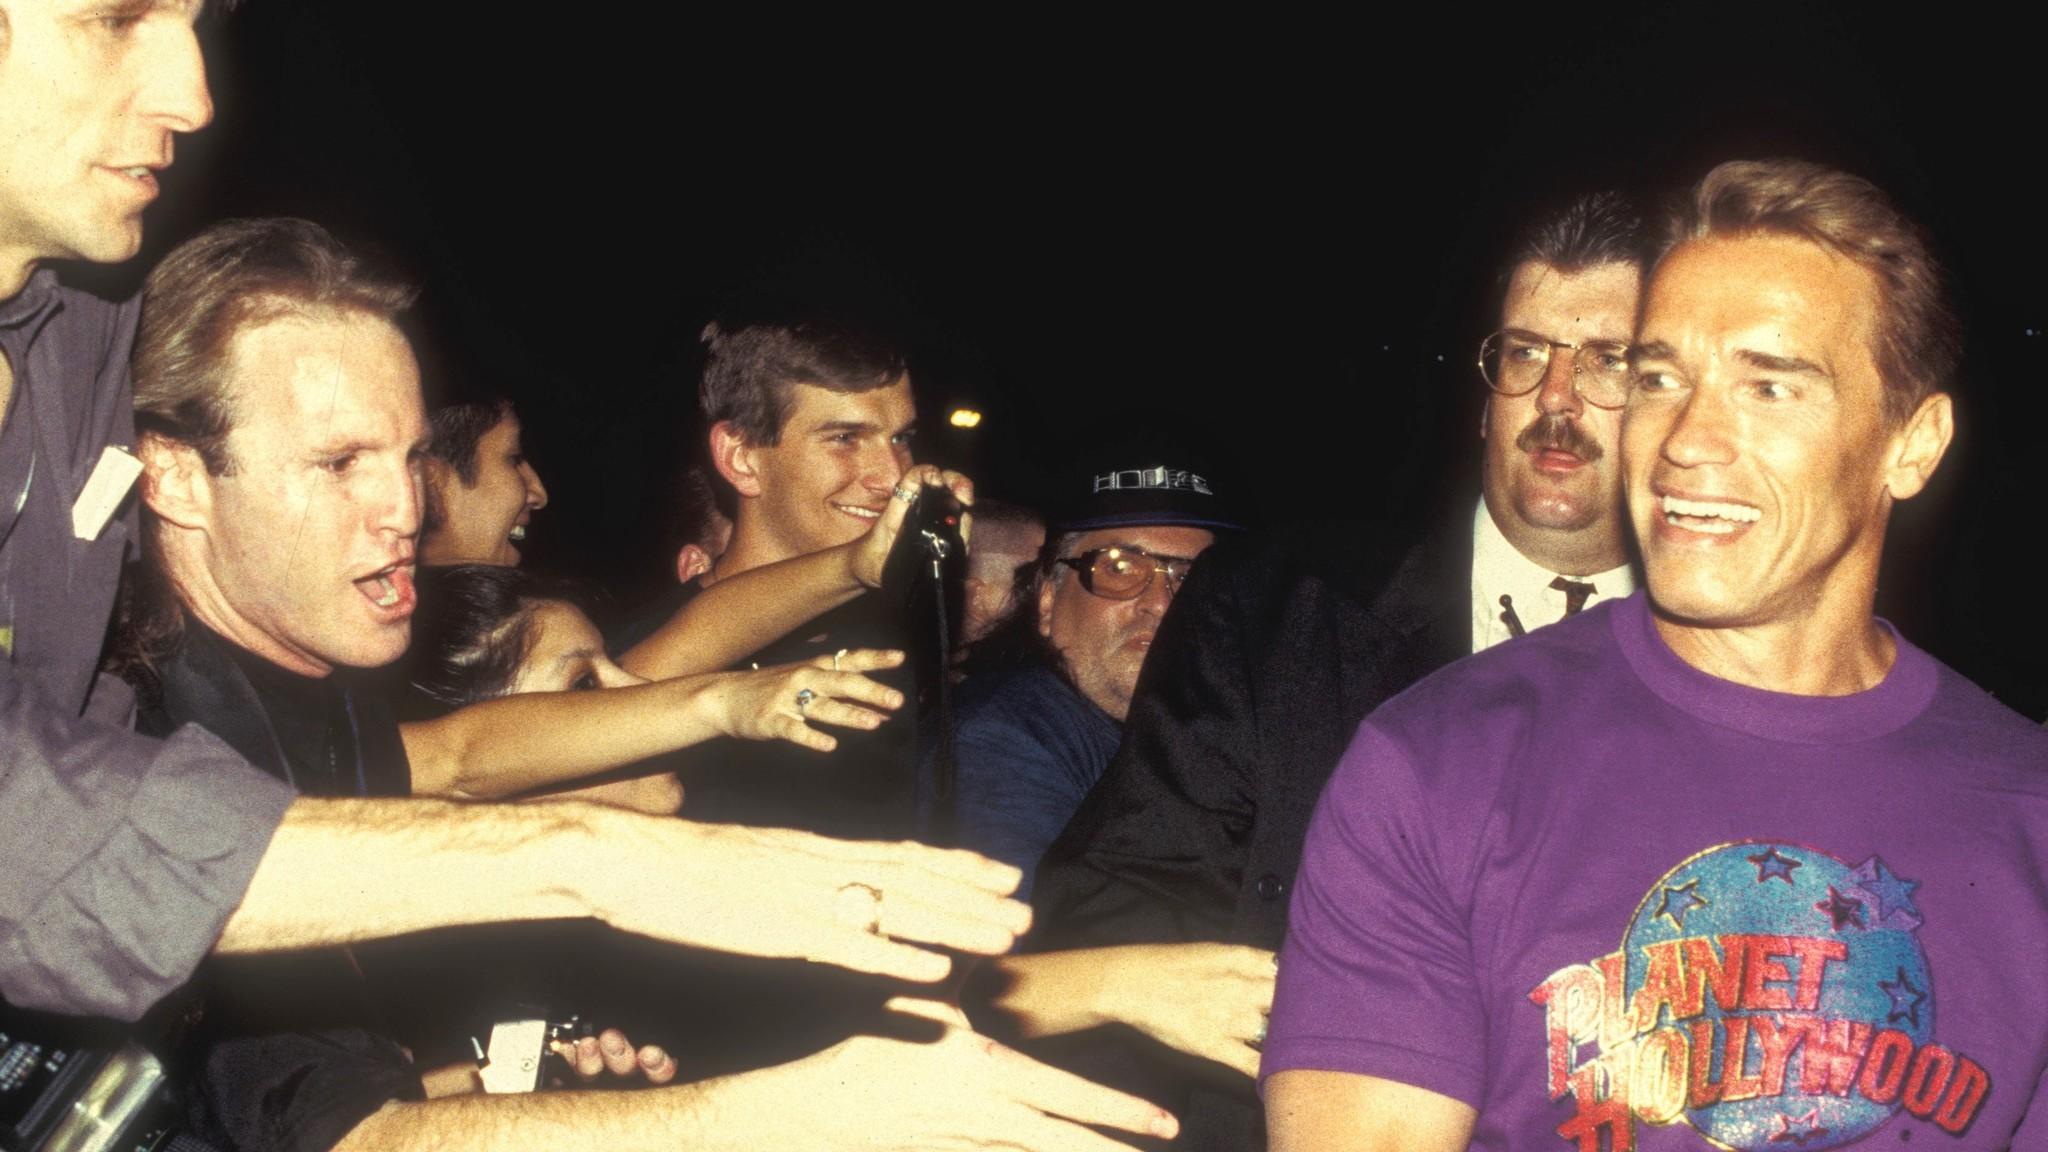 Fans greet Arnold Schwarzenegger as he arrives at the Forum Shops in July 1994.